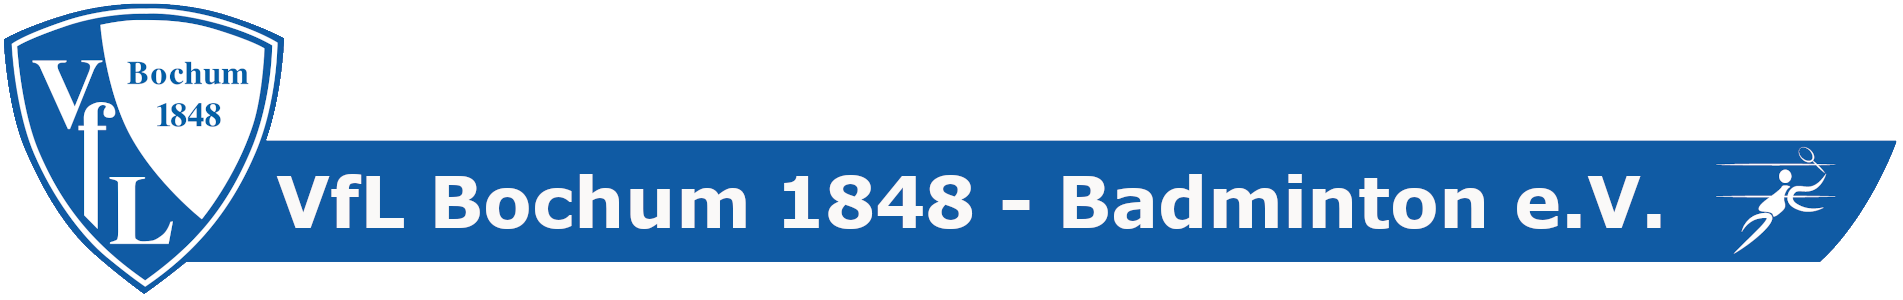 VfL Bochum 1848 –  Badminton e.V.